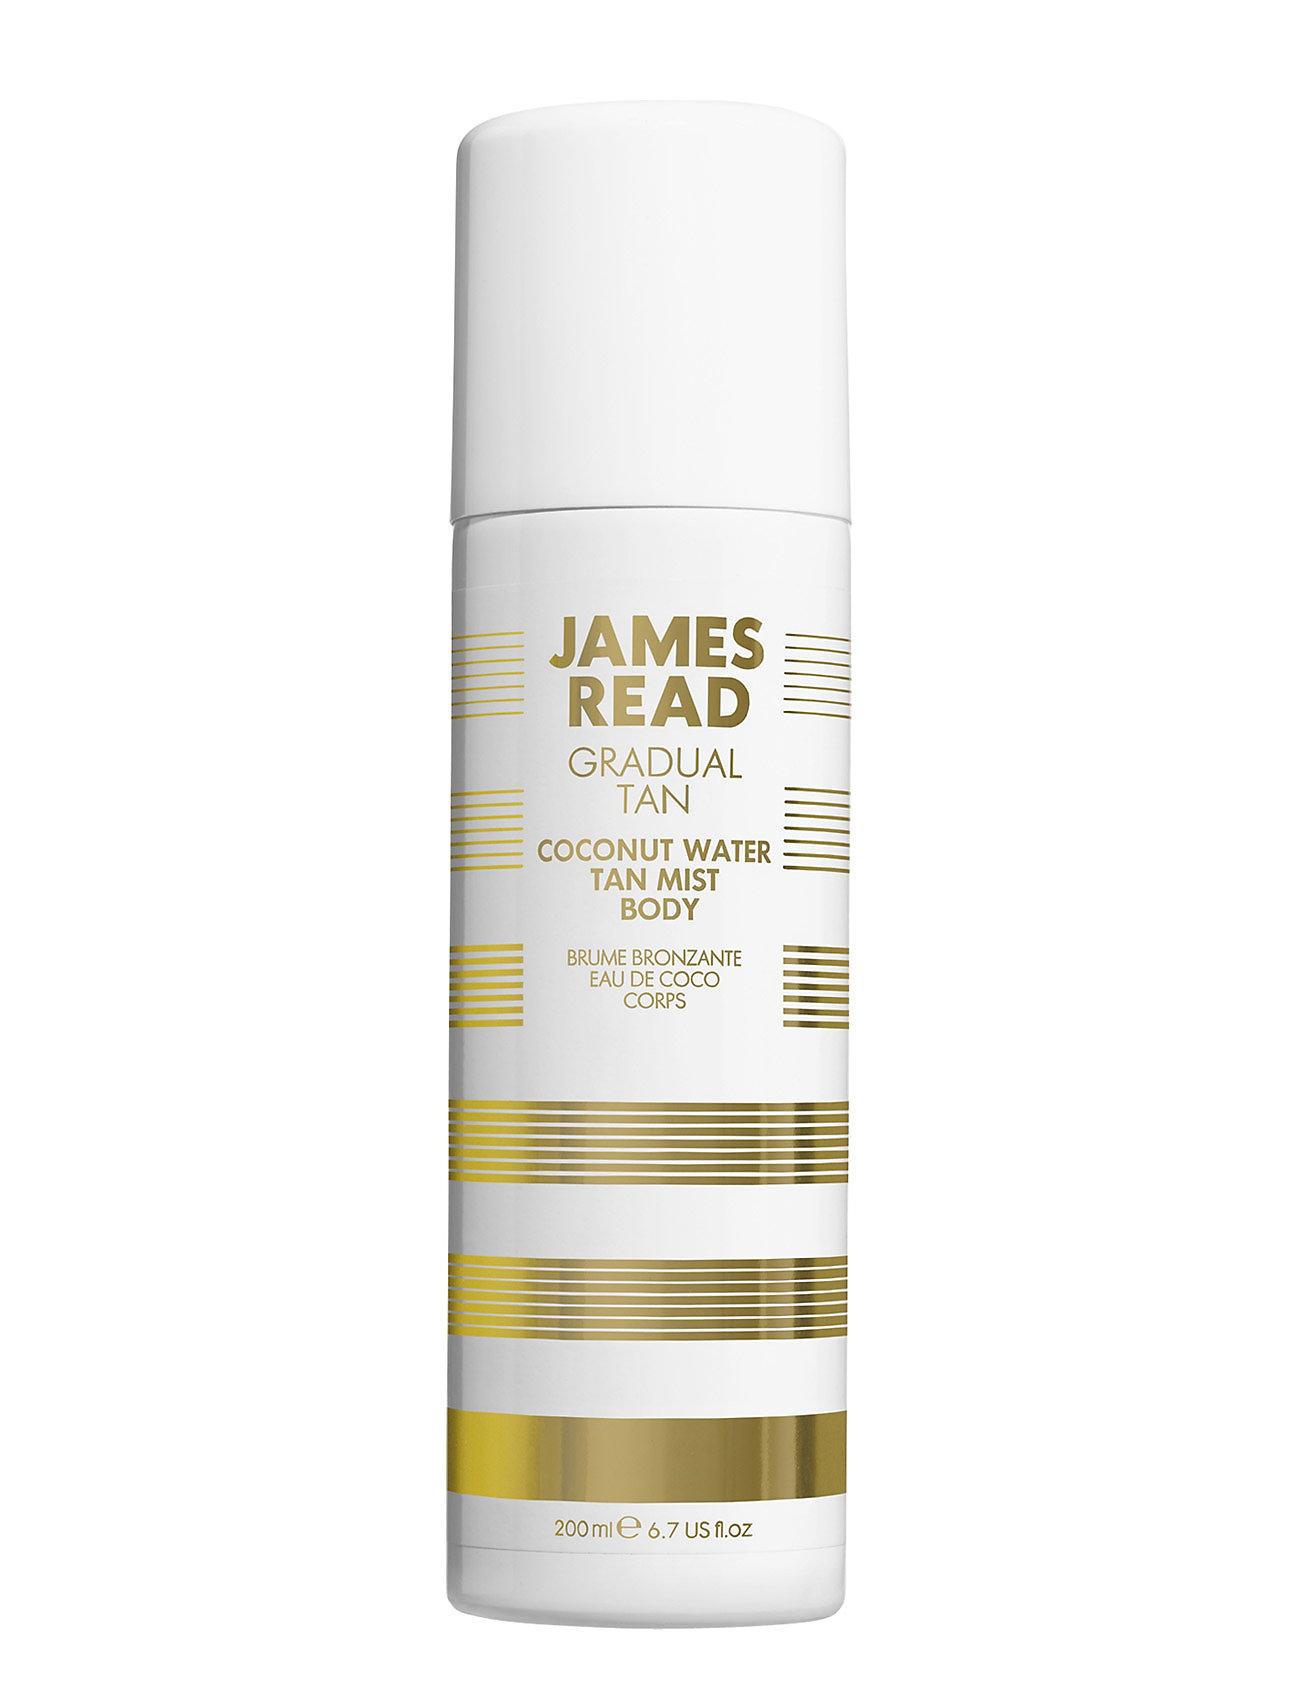 Image of Coconut Water Tan Mist Body Selvbruner Nude James Read (3309259339)